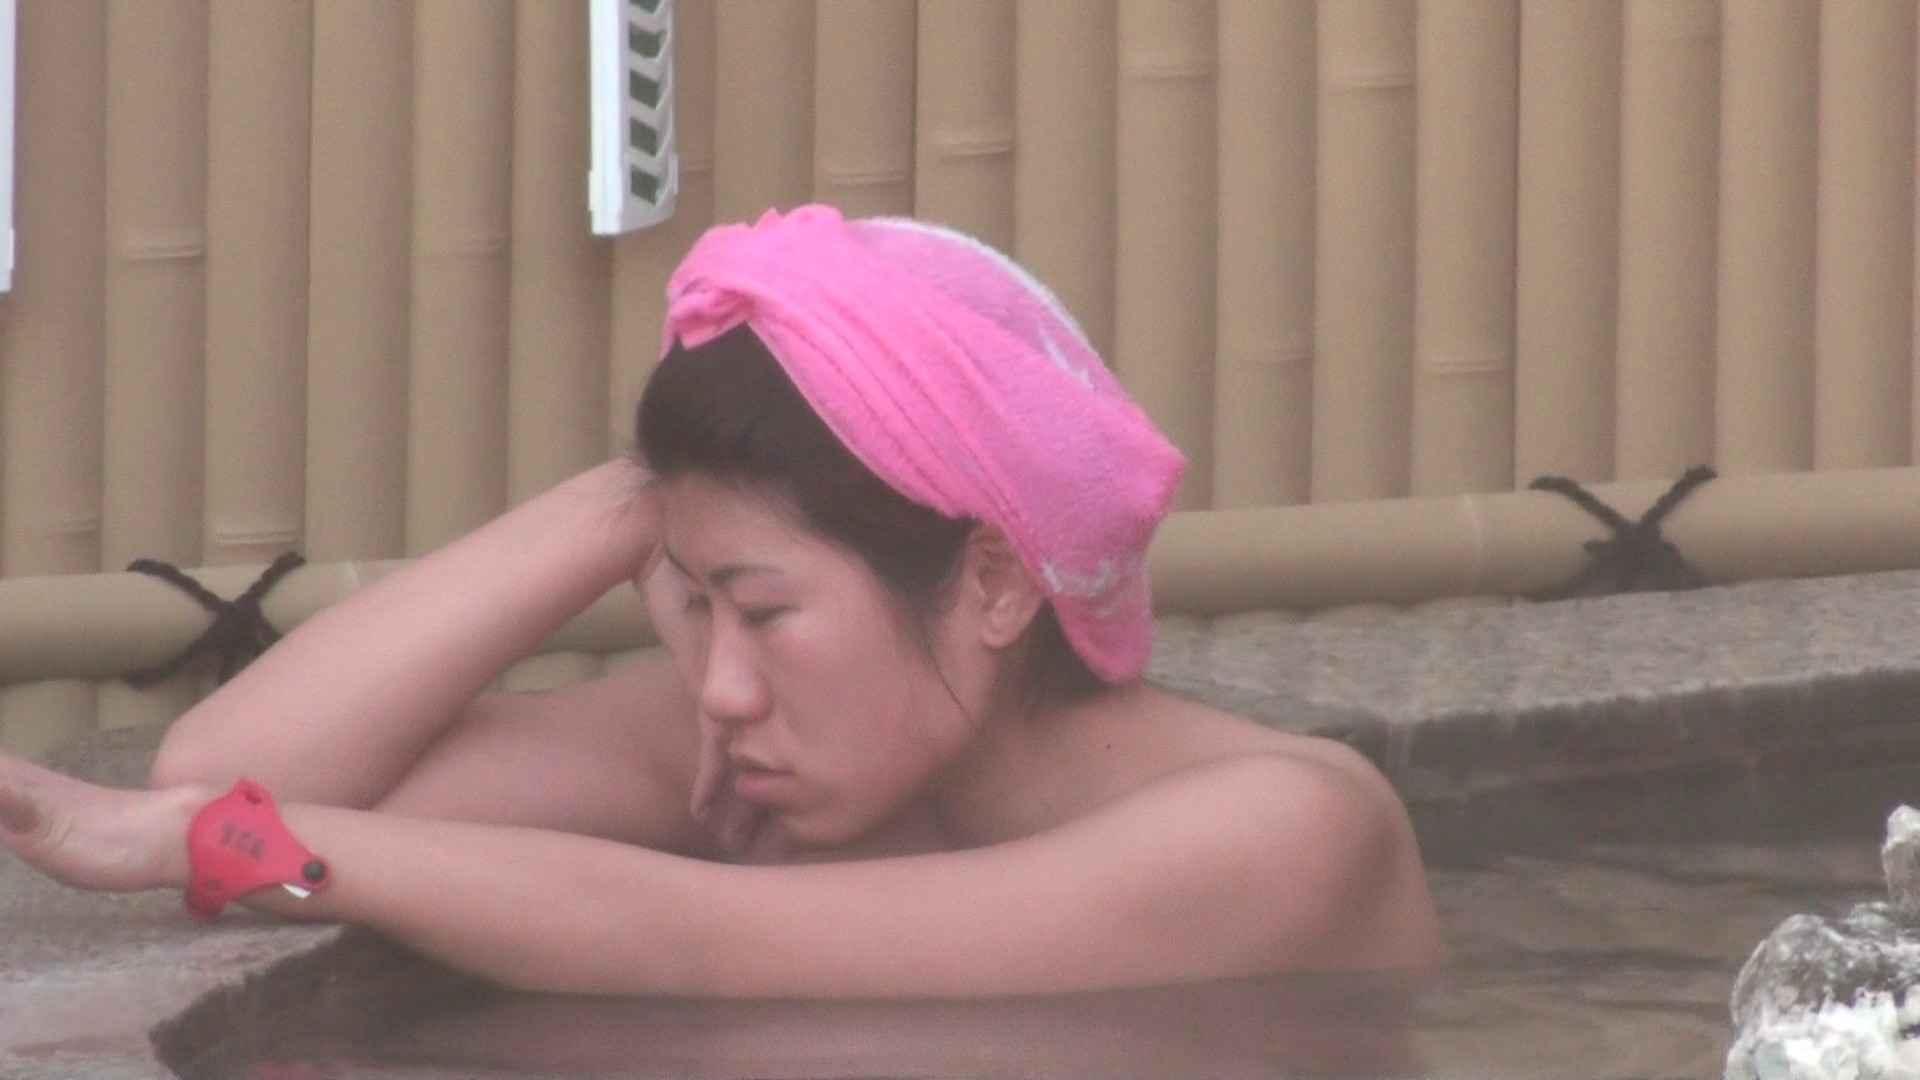 Aquaな露天風呂Vol.134 盗撮   OLセックス  48画像 10